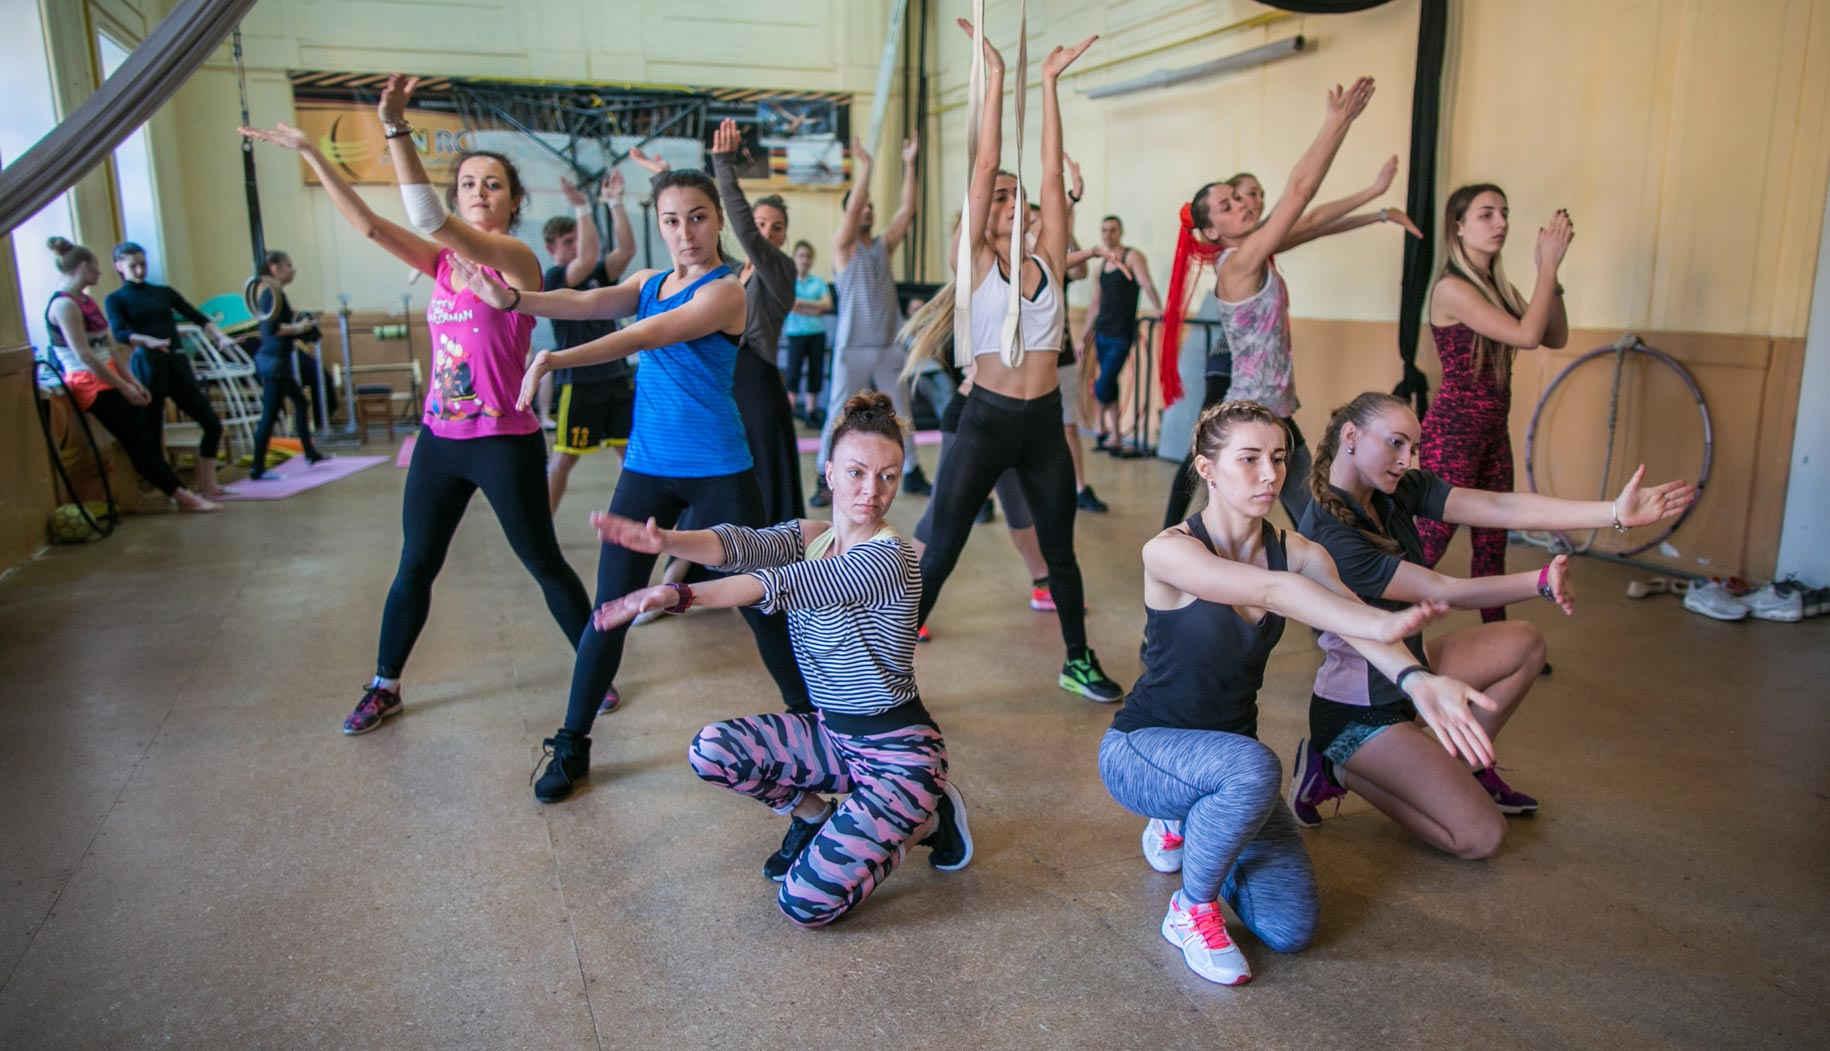 Kherson: A Circus Abroad